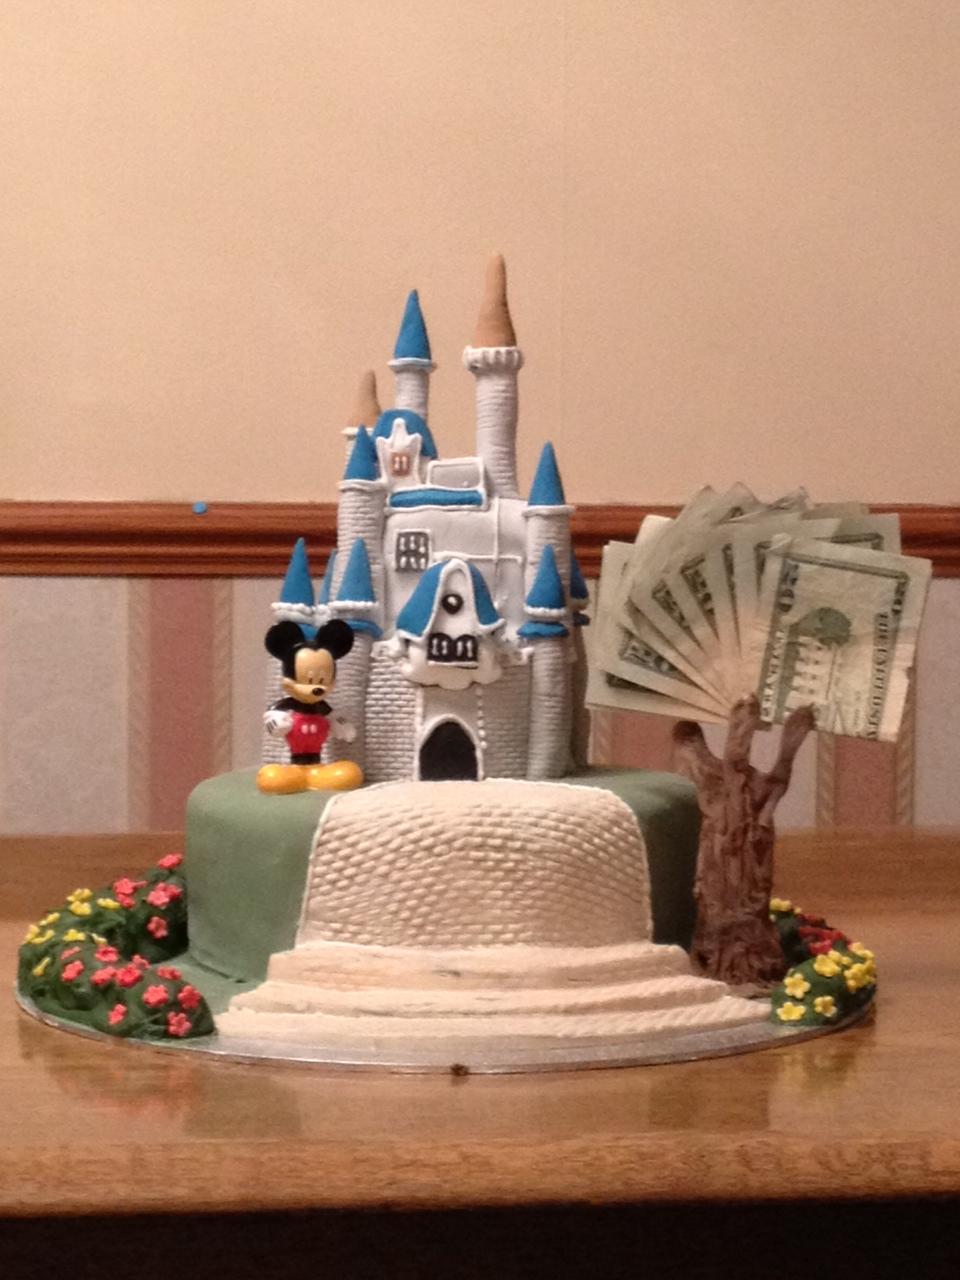 Crafty Cakes And Cards Grahams Disney Birthday Cake